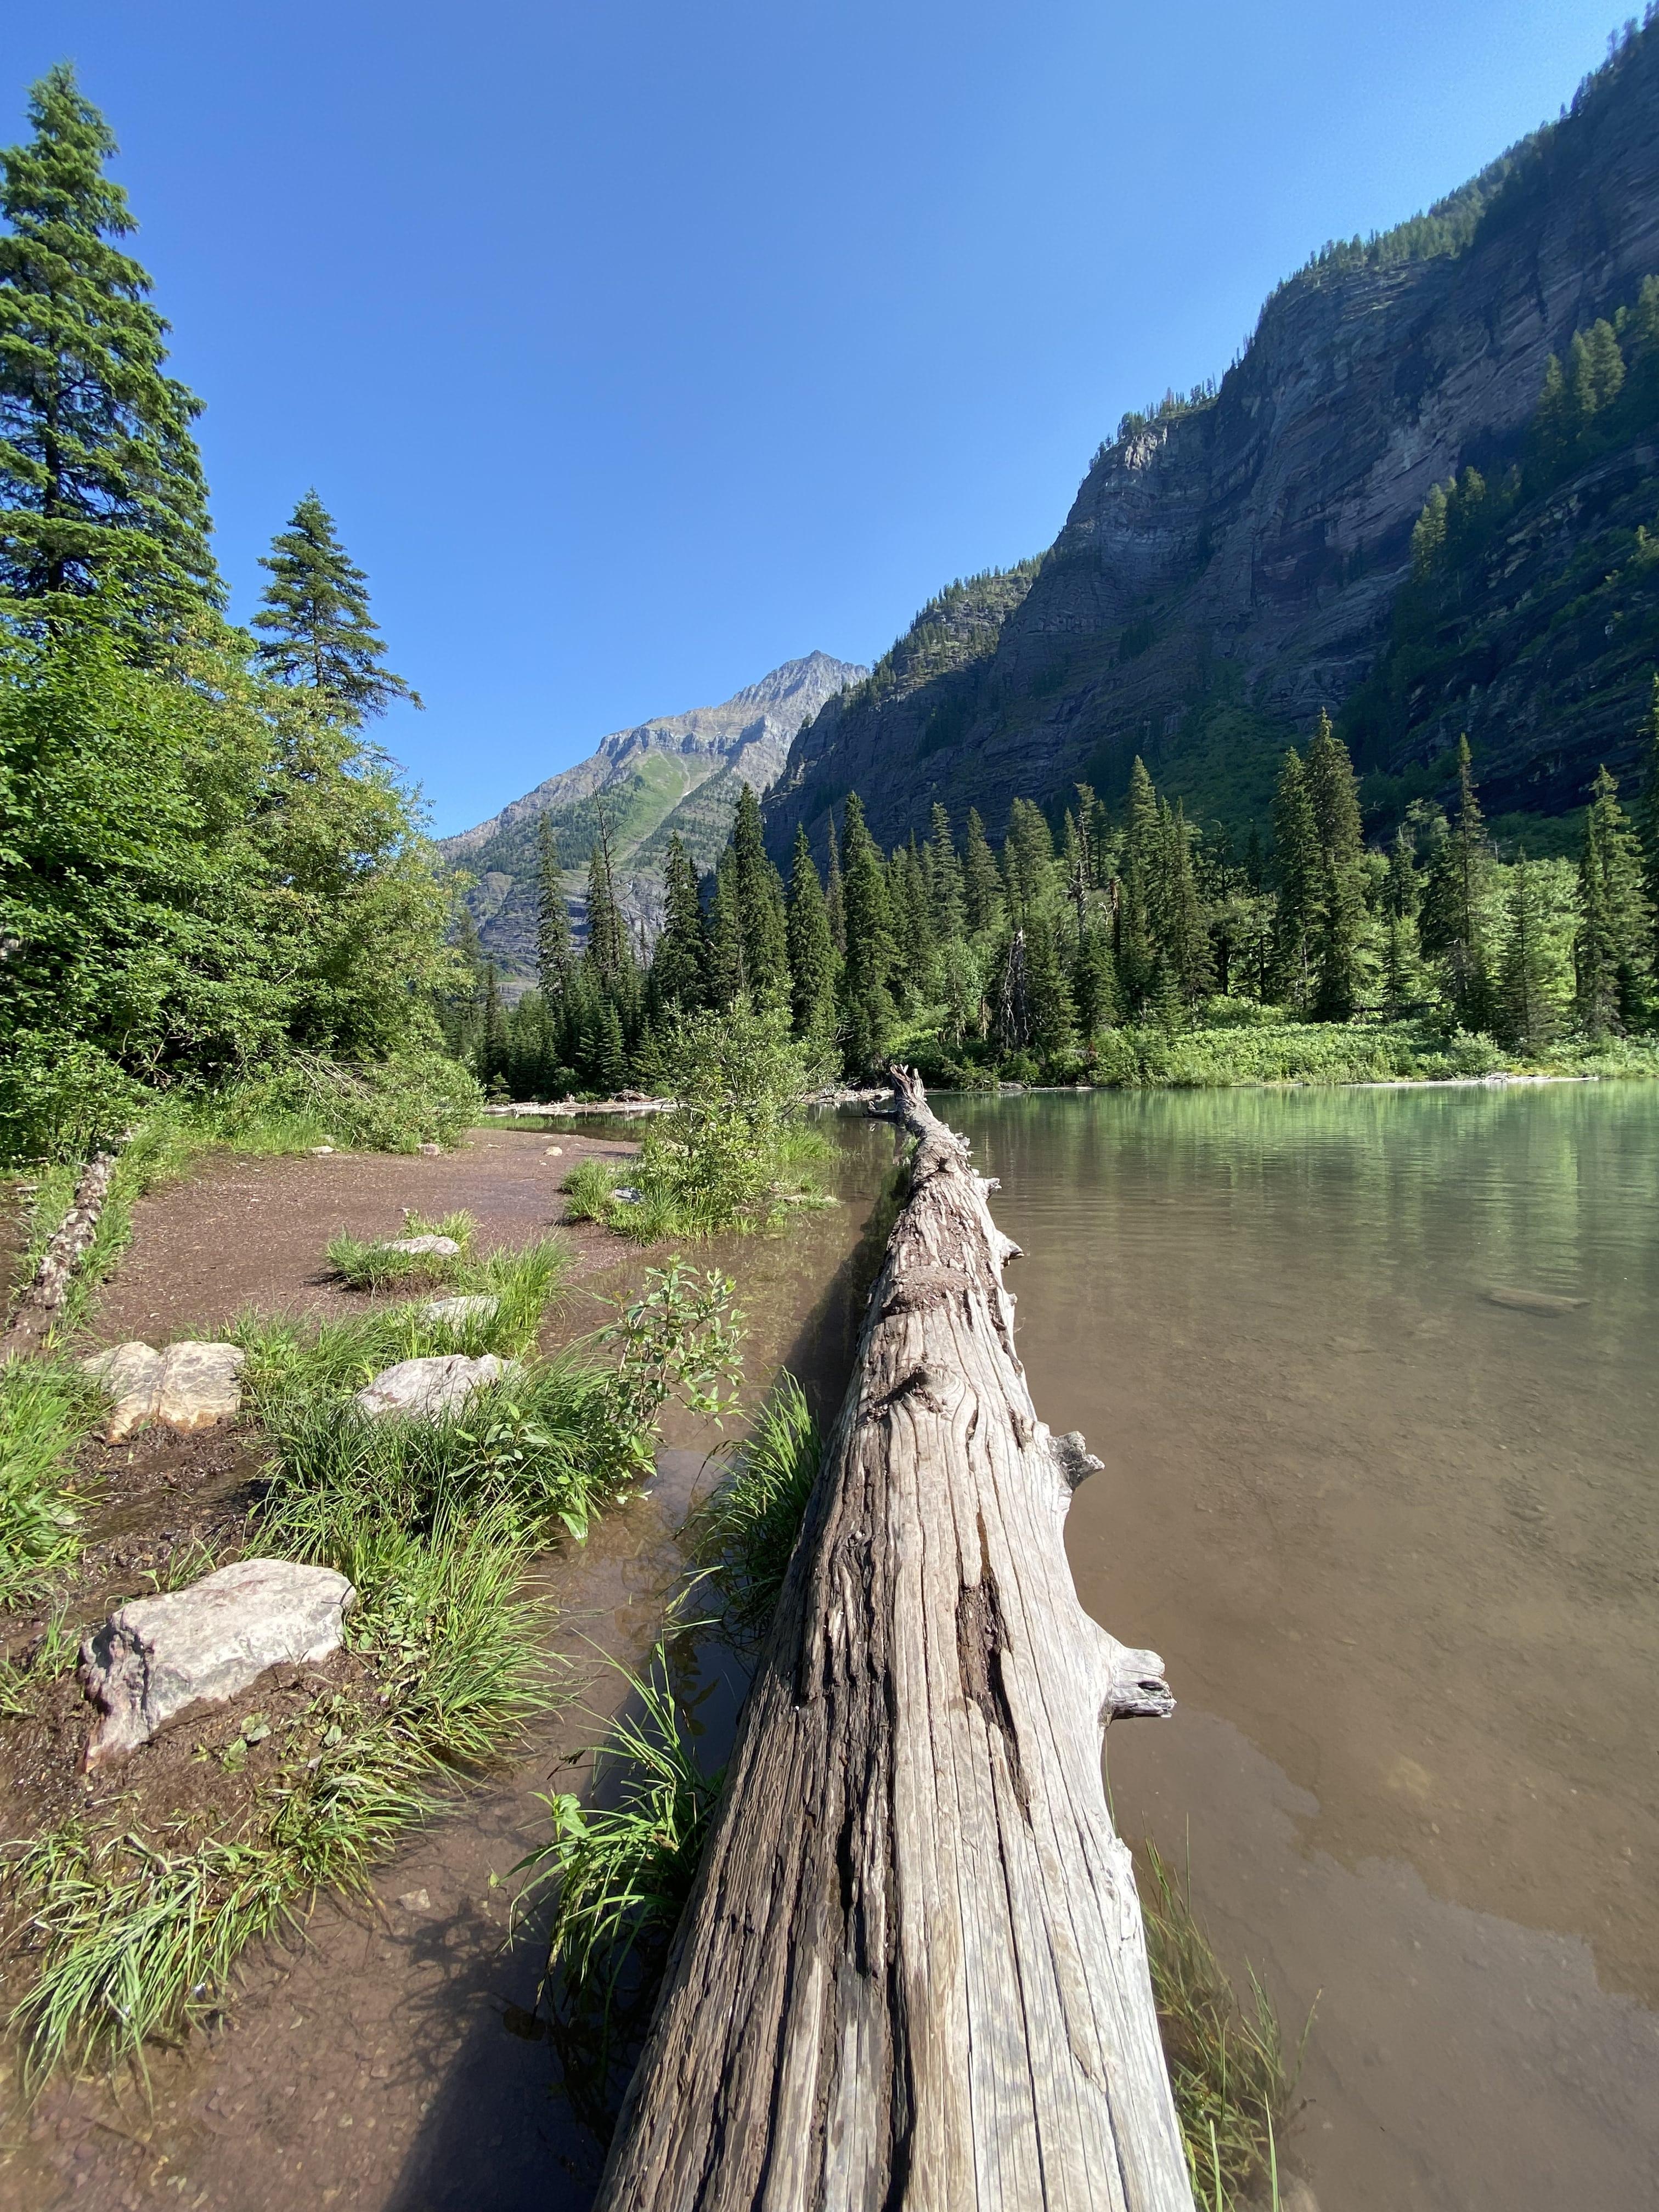 Avalanche trail, MT!